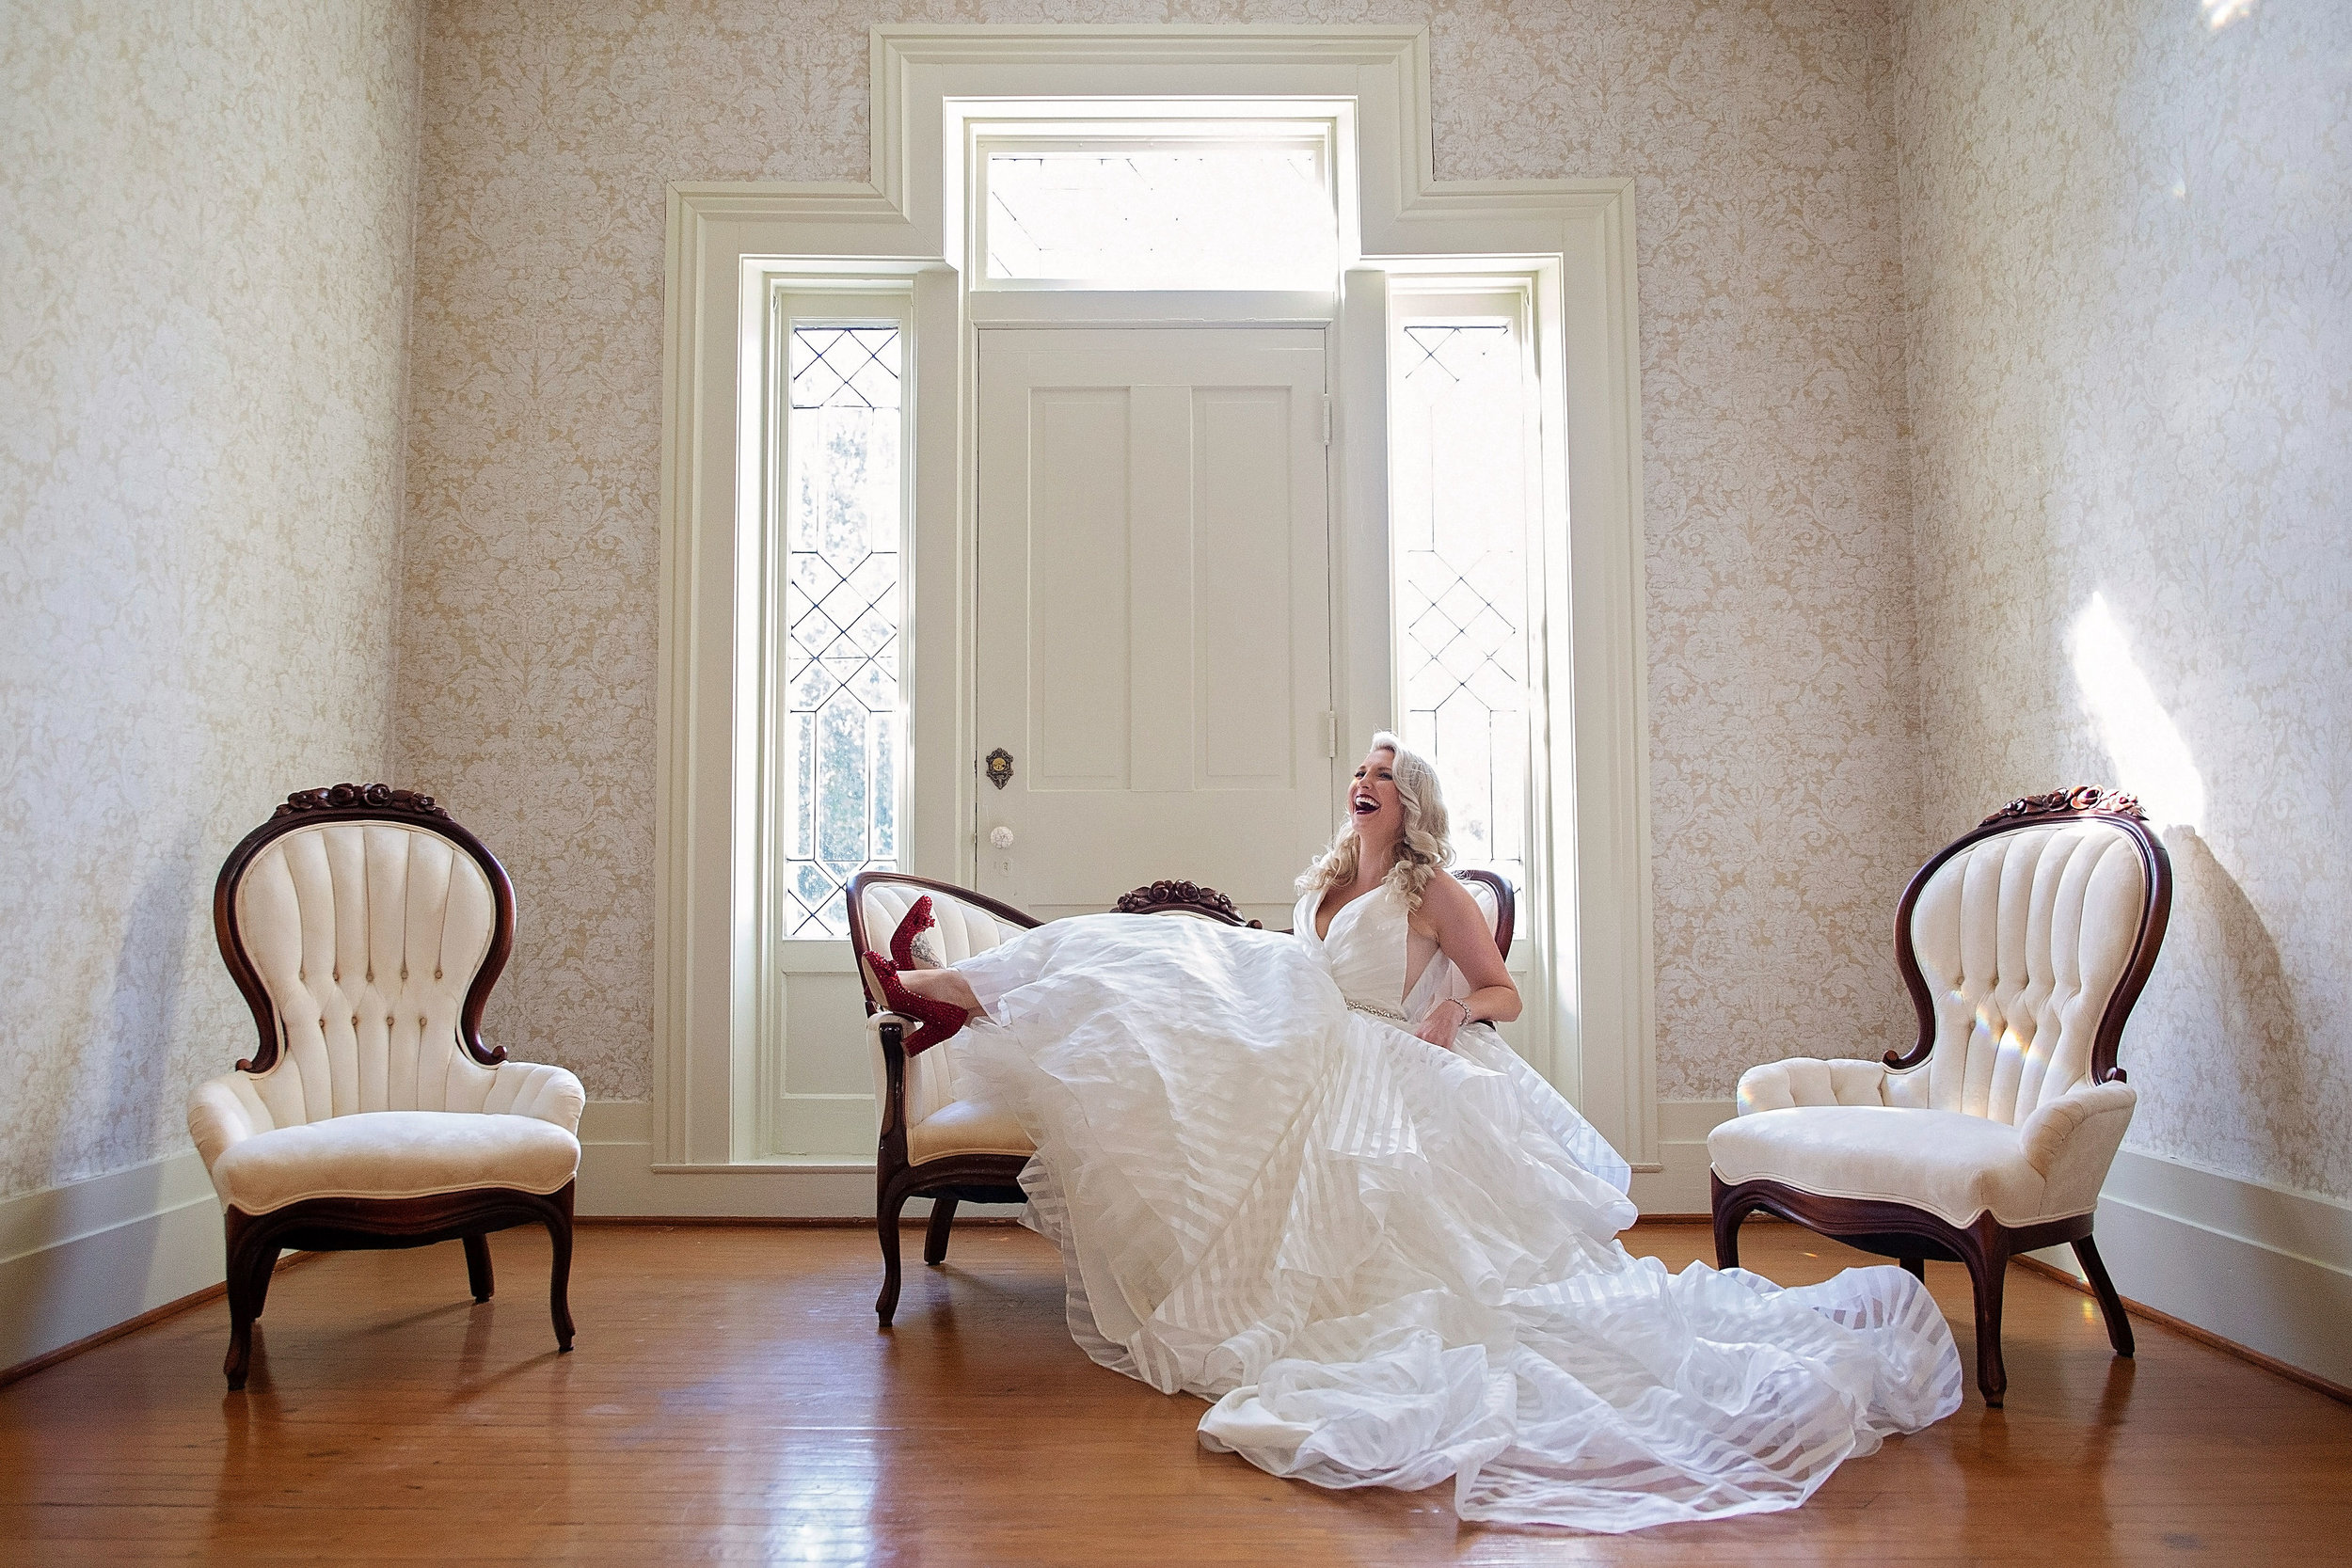 Wedding-bride-danville-ky.jpg